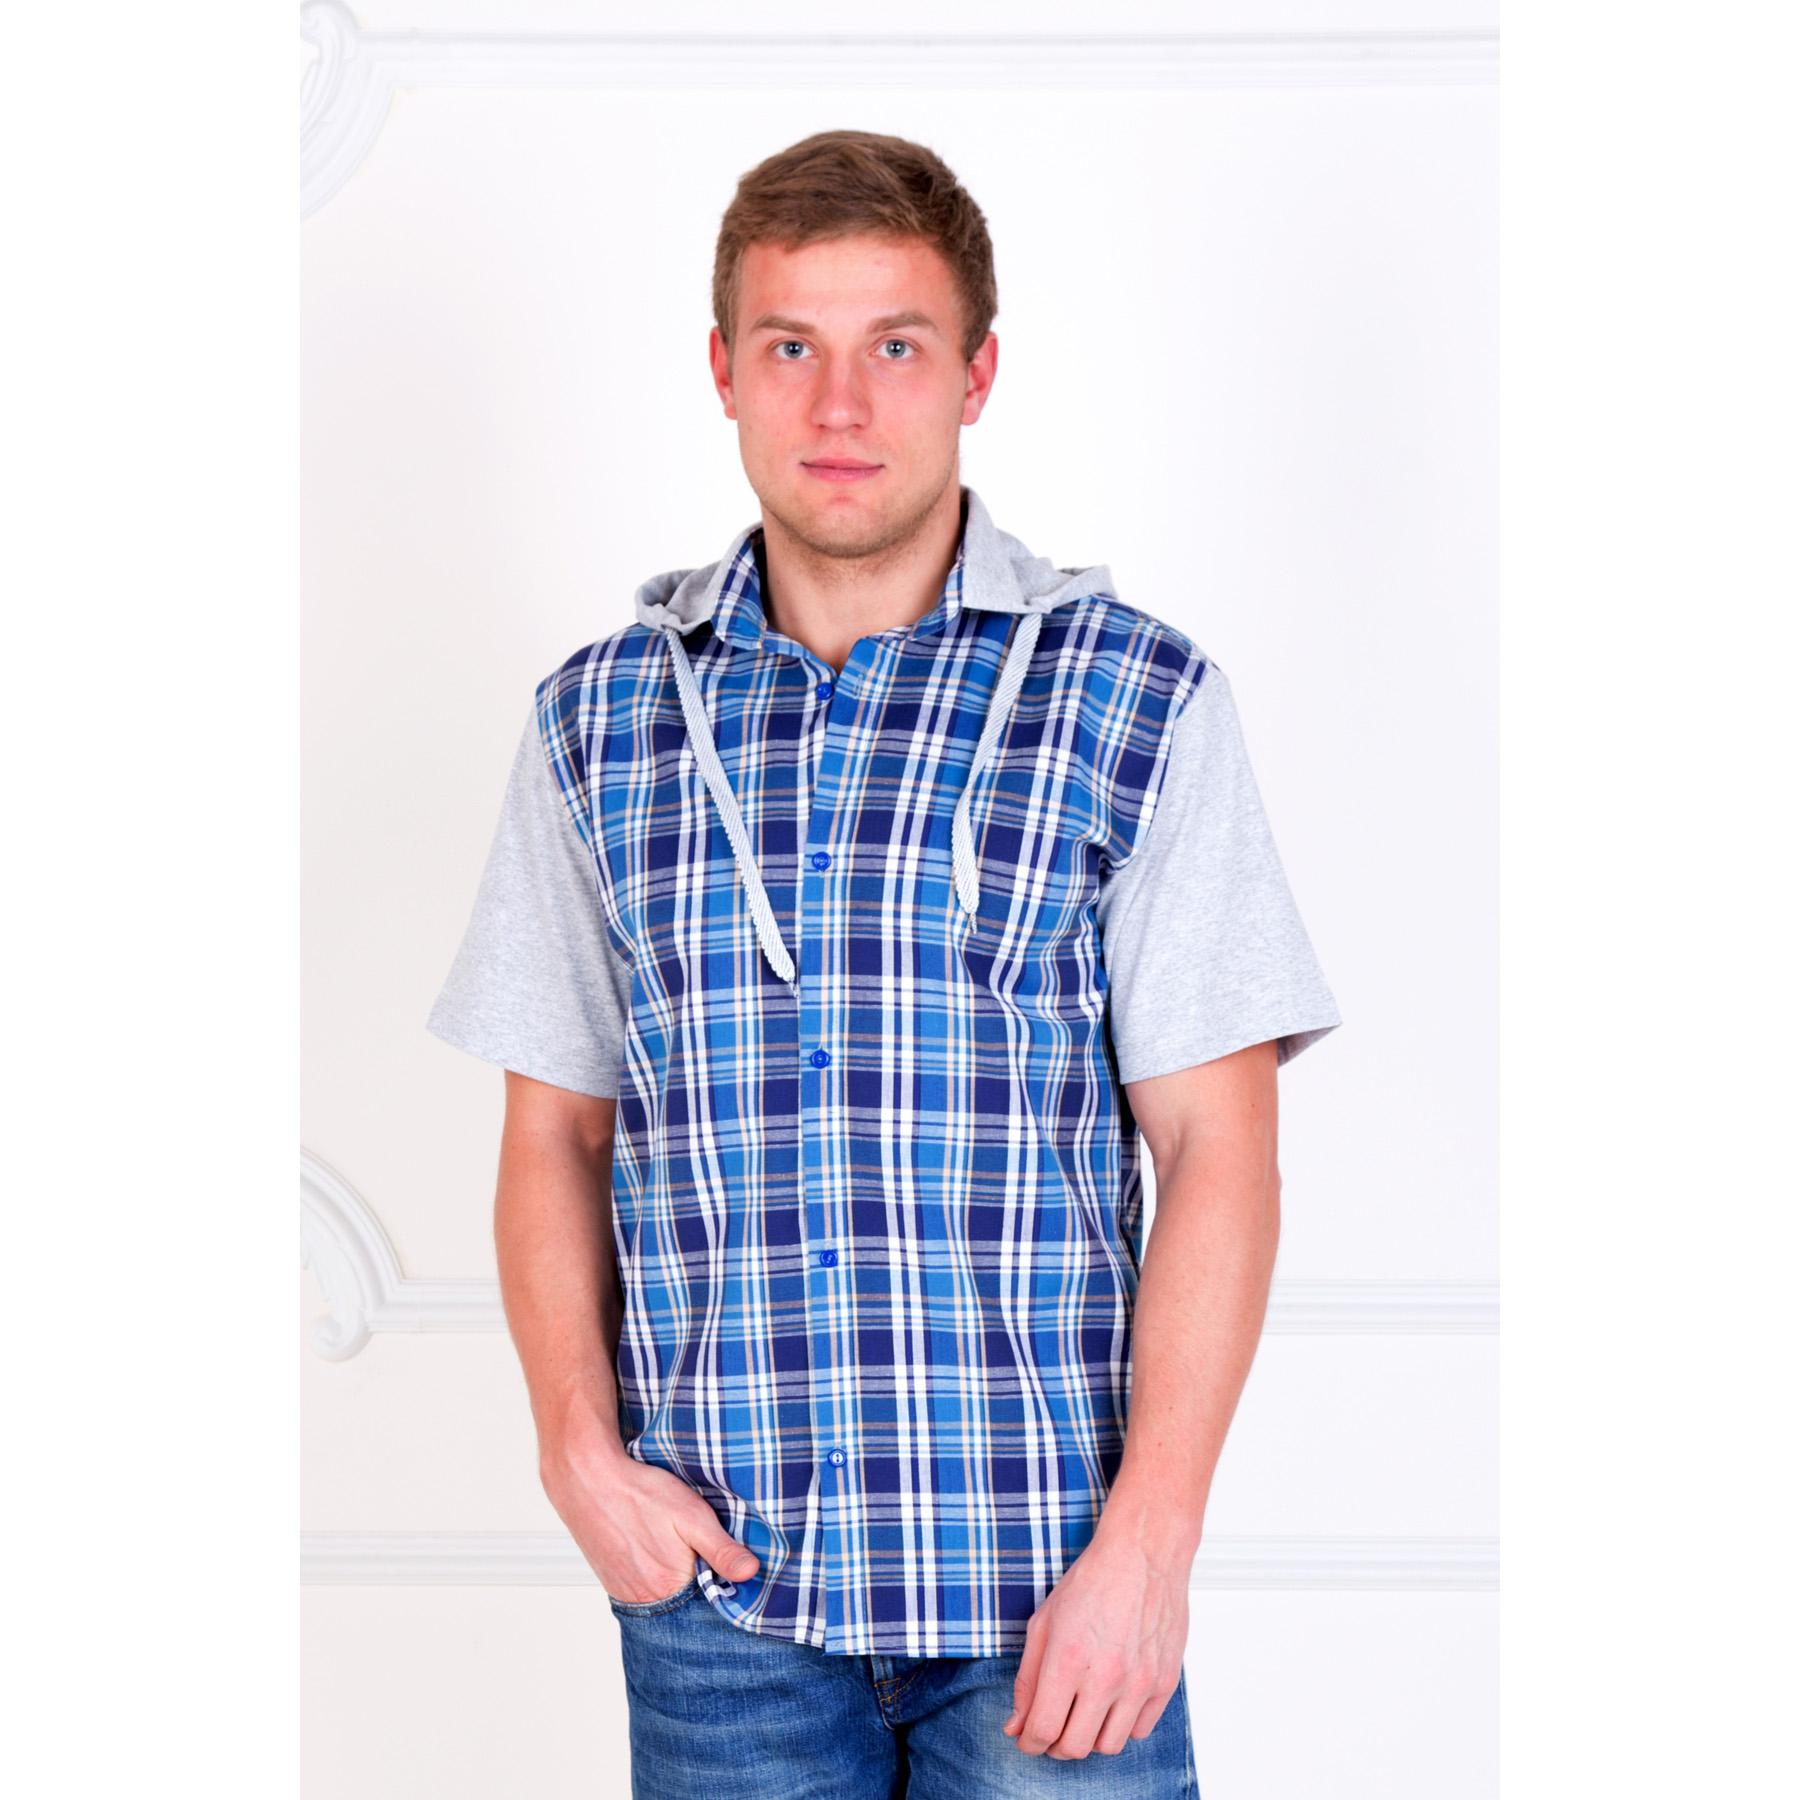 Мужская рубашка «Юстин» арт. 0031, размер 42Рубашки<br>Обхват груди: 84 см <br>Обхват талии: 84 см <br>Обхват бедер: 88 см <br>Рост: 170-176 см<br><br>Тип: Муж. рубашка<br>Размер: 42<br>Материал: Шотландка